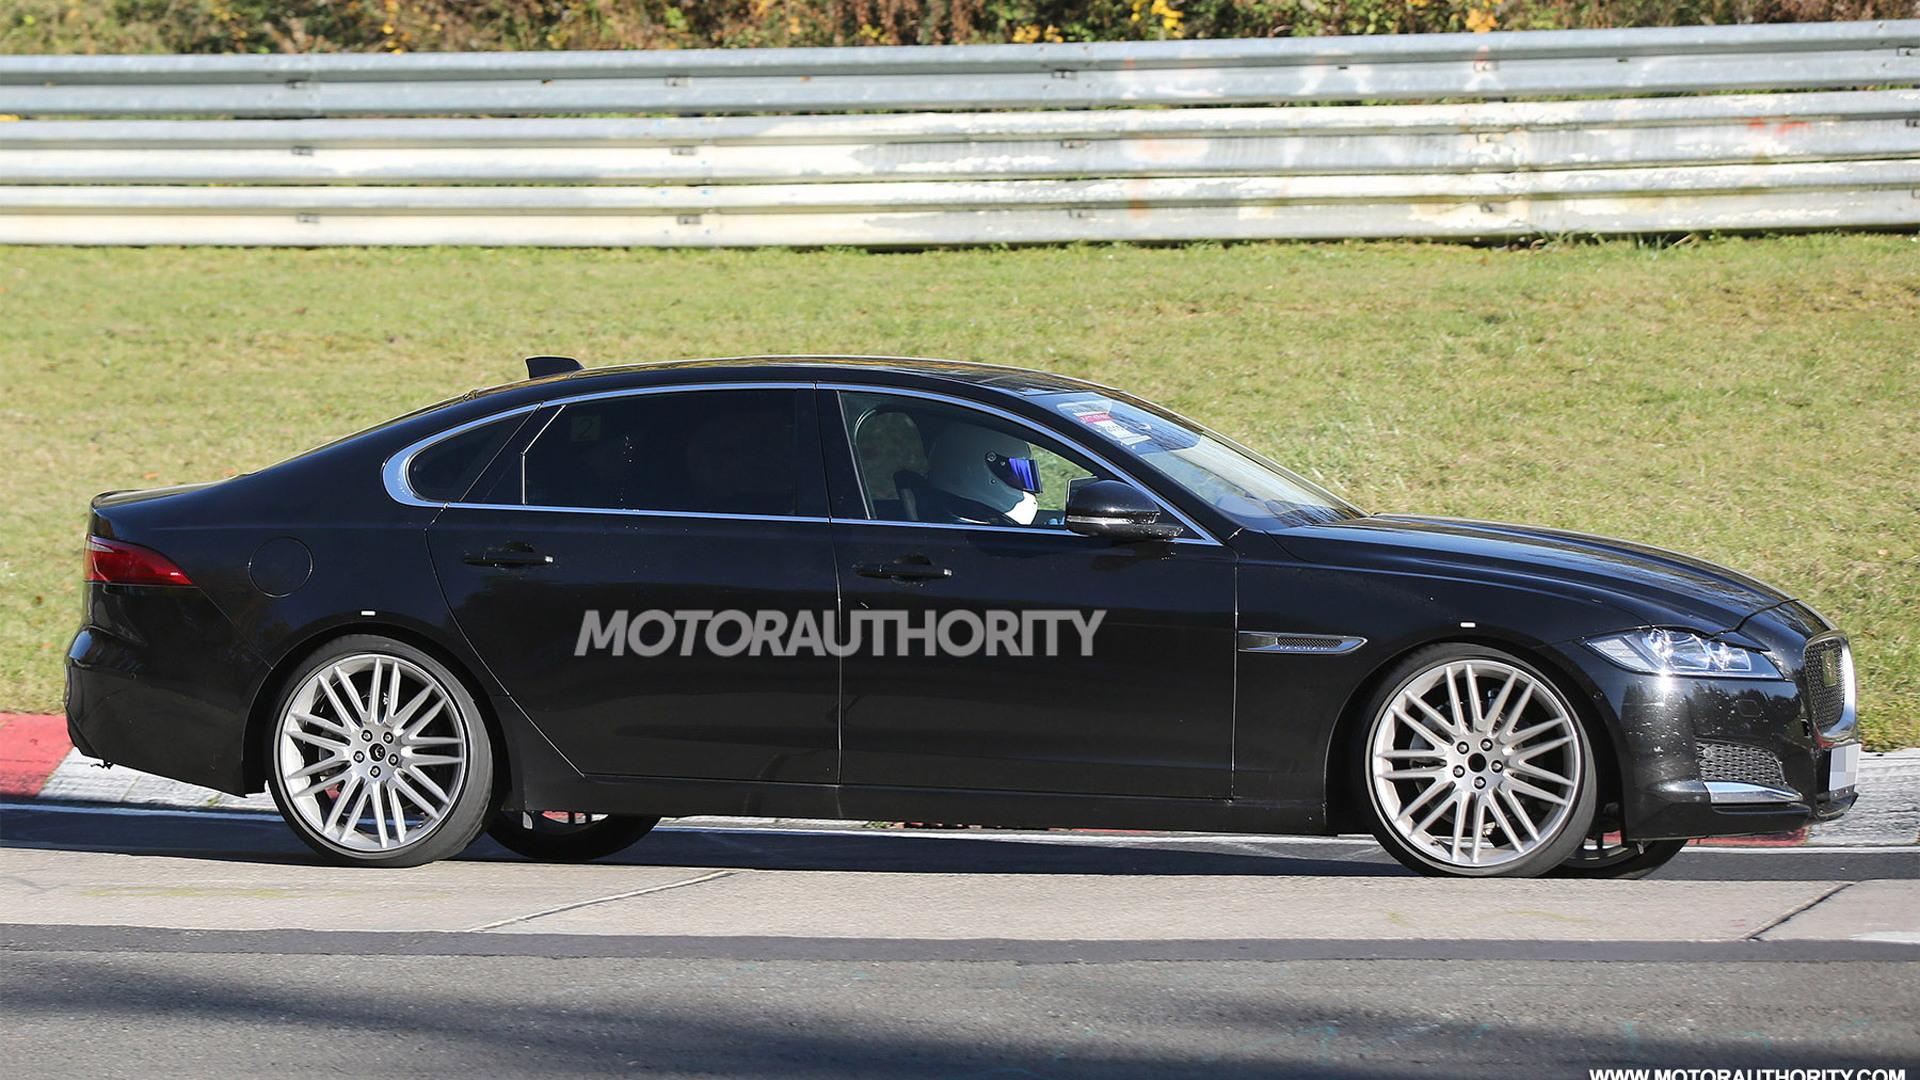 2016 Jaguar XF LWB spy shots - Image via S. Baldauf/SB-Medien